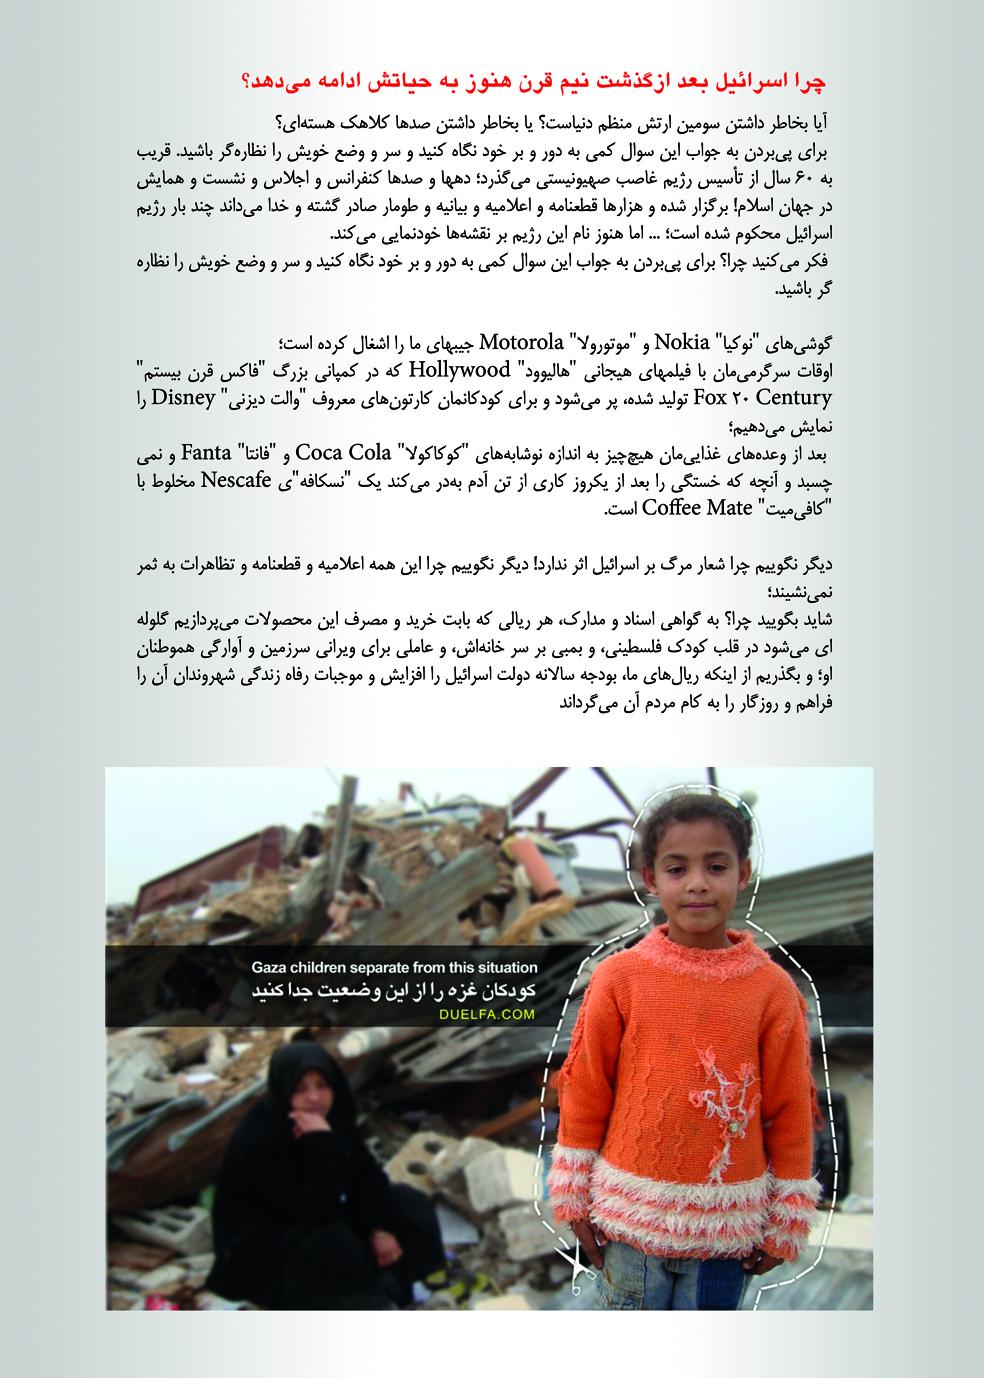 http://sobhegharib3.persiangig.com/image/namayeshgah/a2.jpg